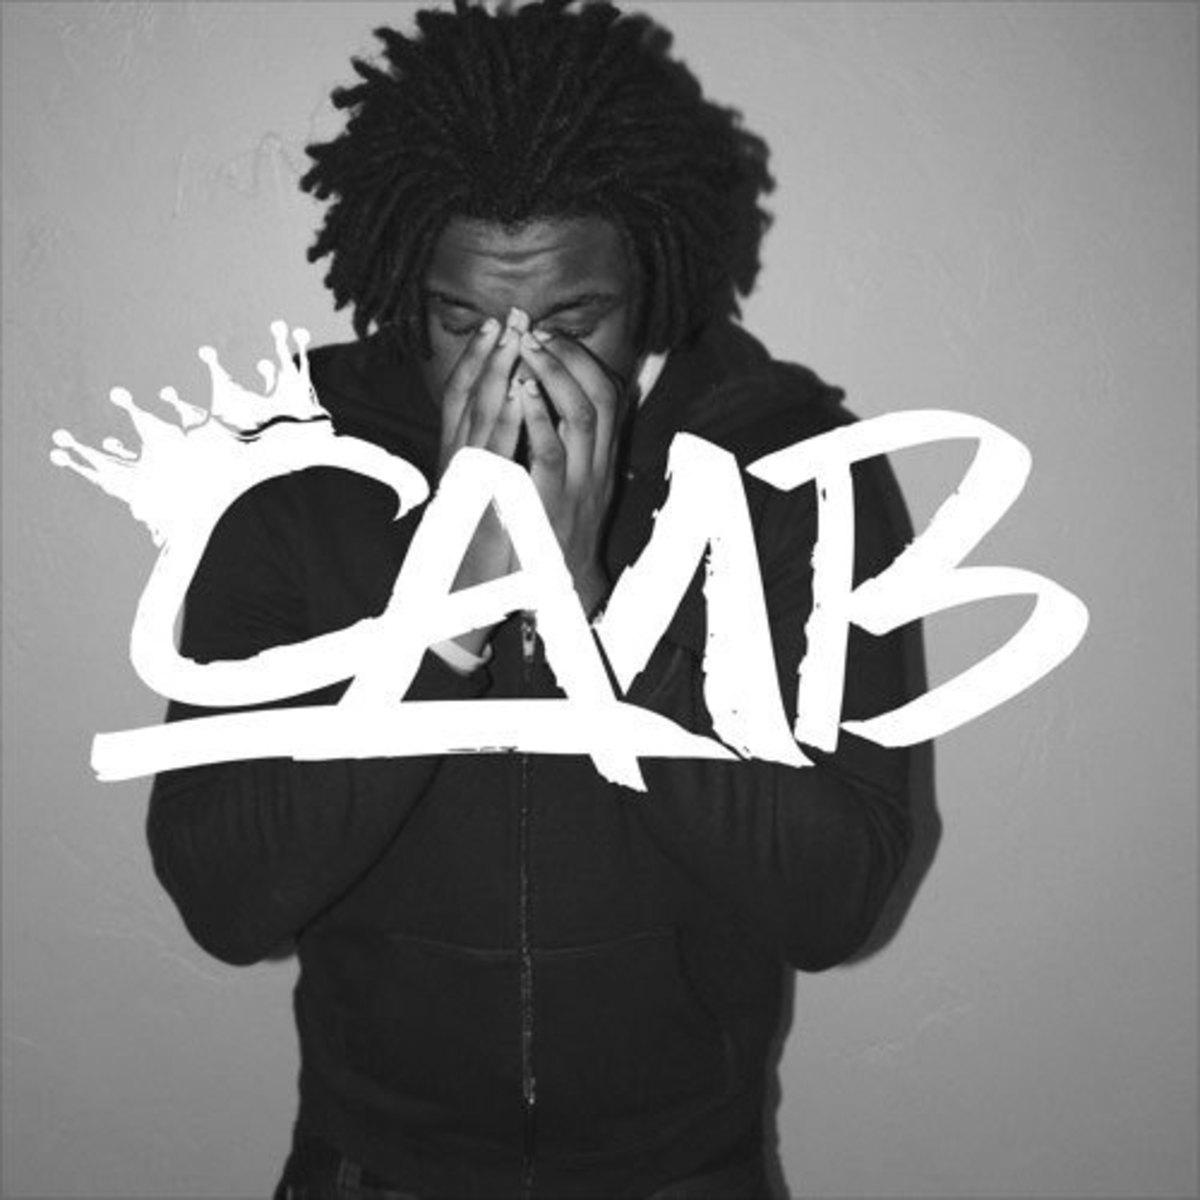 camb.jpg